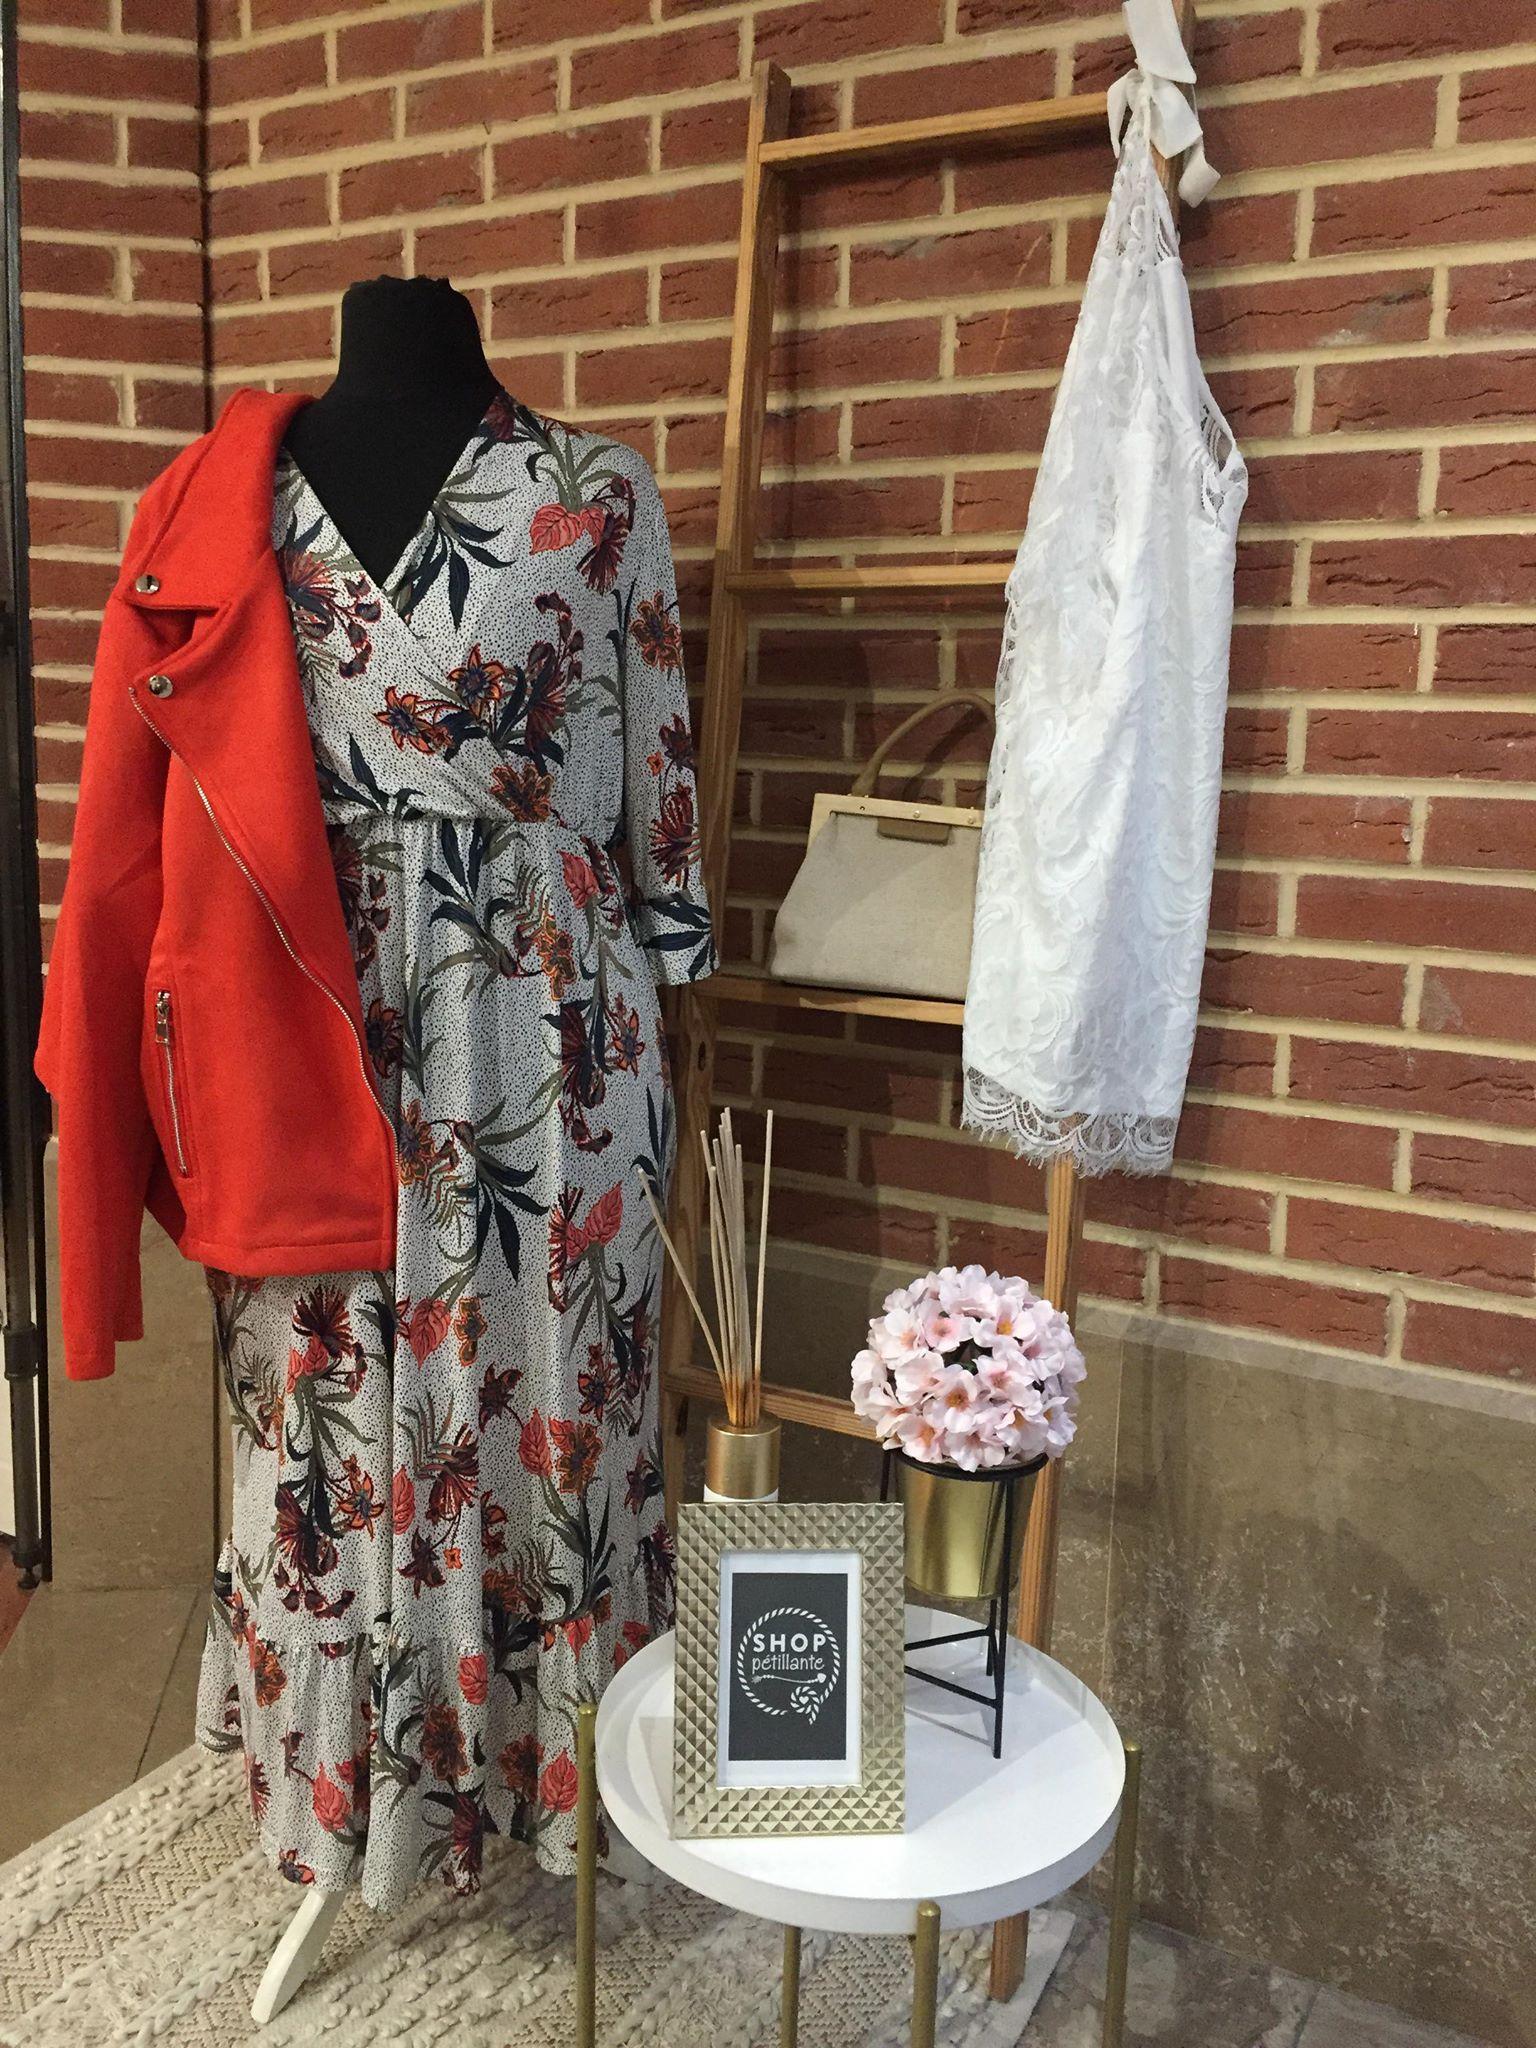 robe longue a fleur - ROB_LON_A-fleur